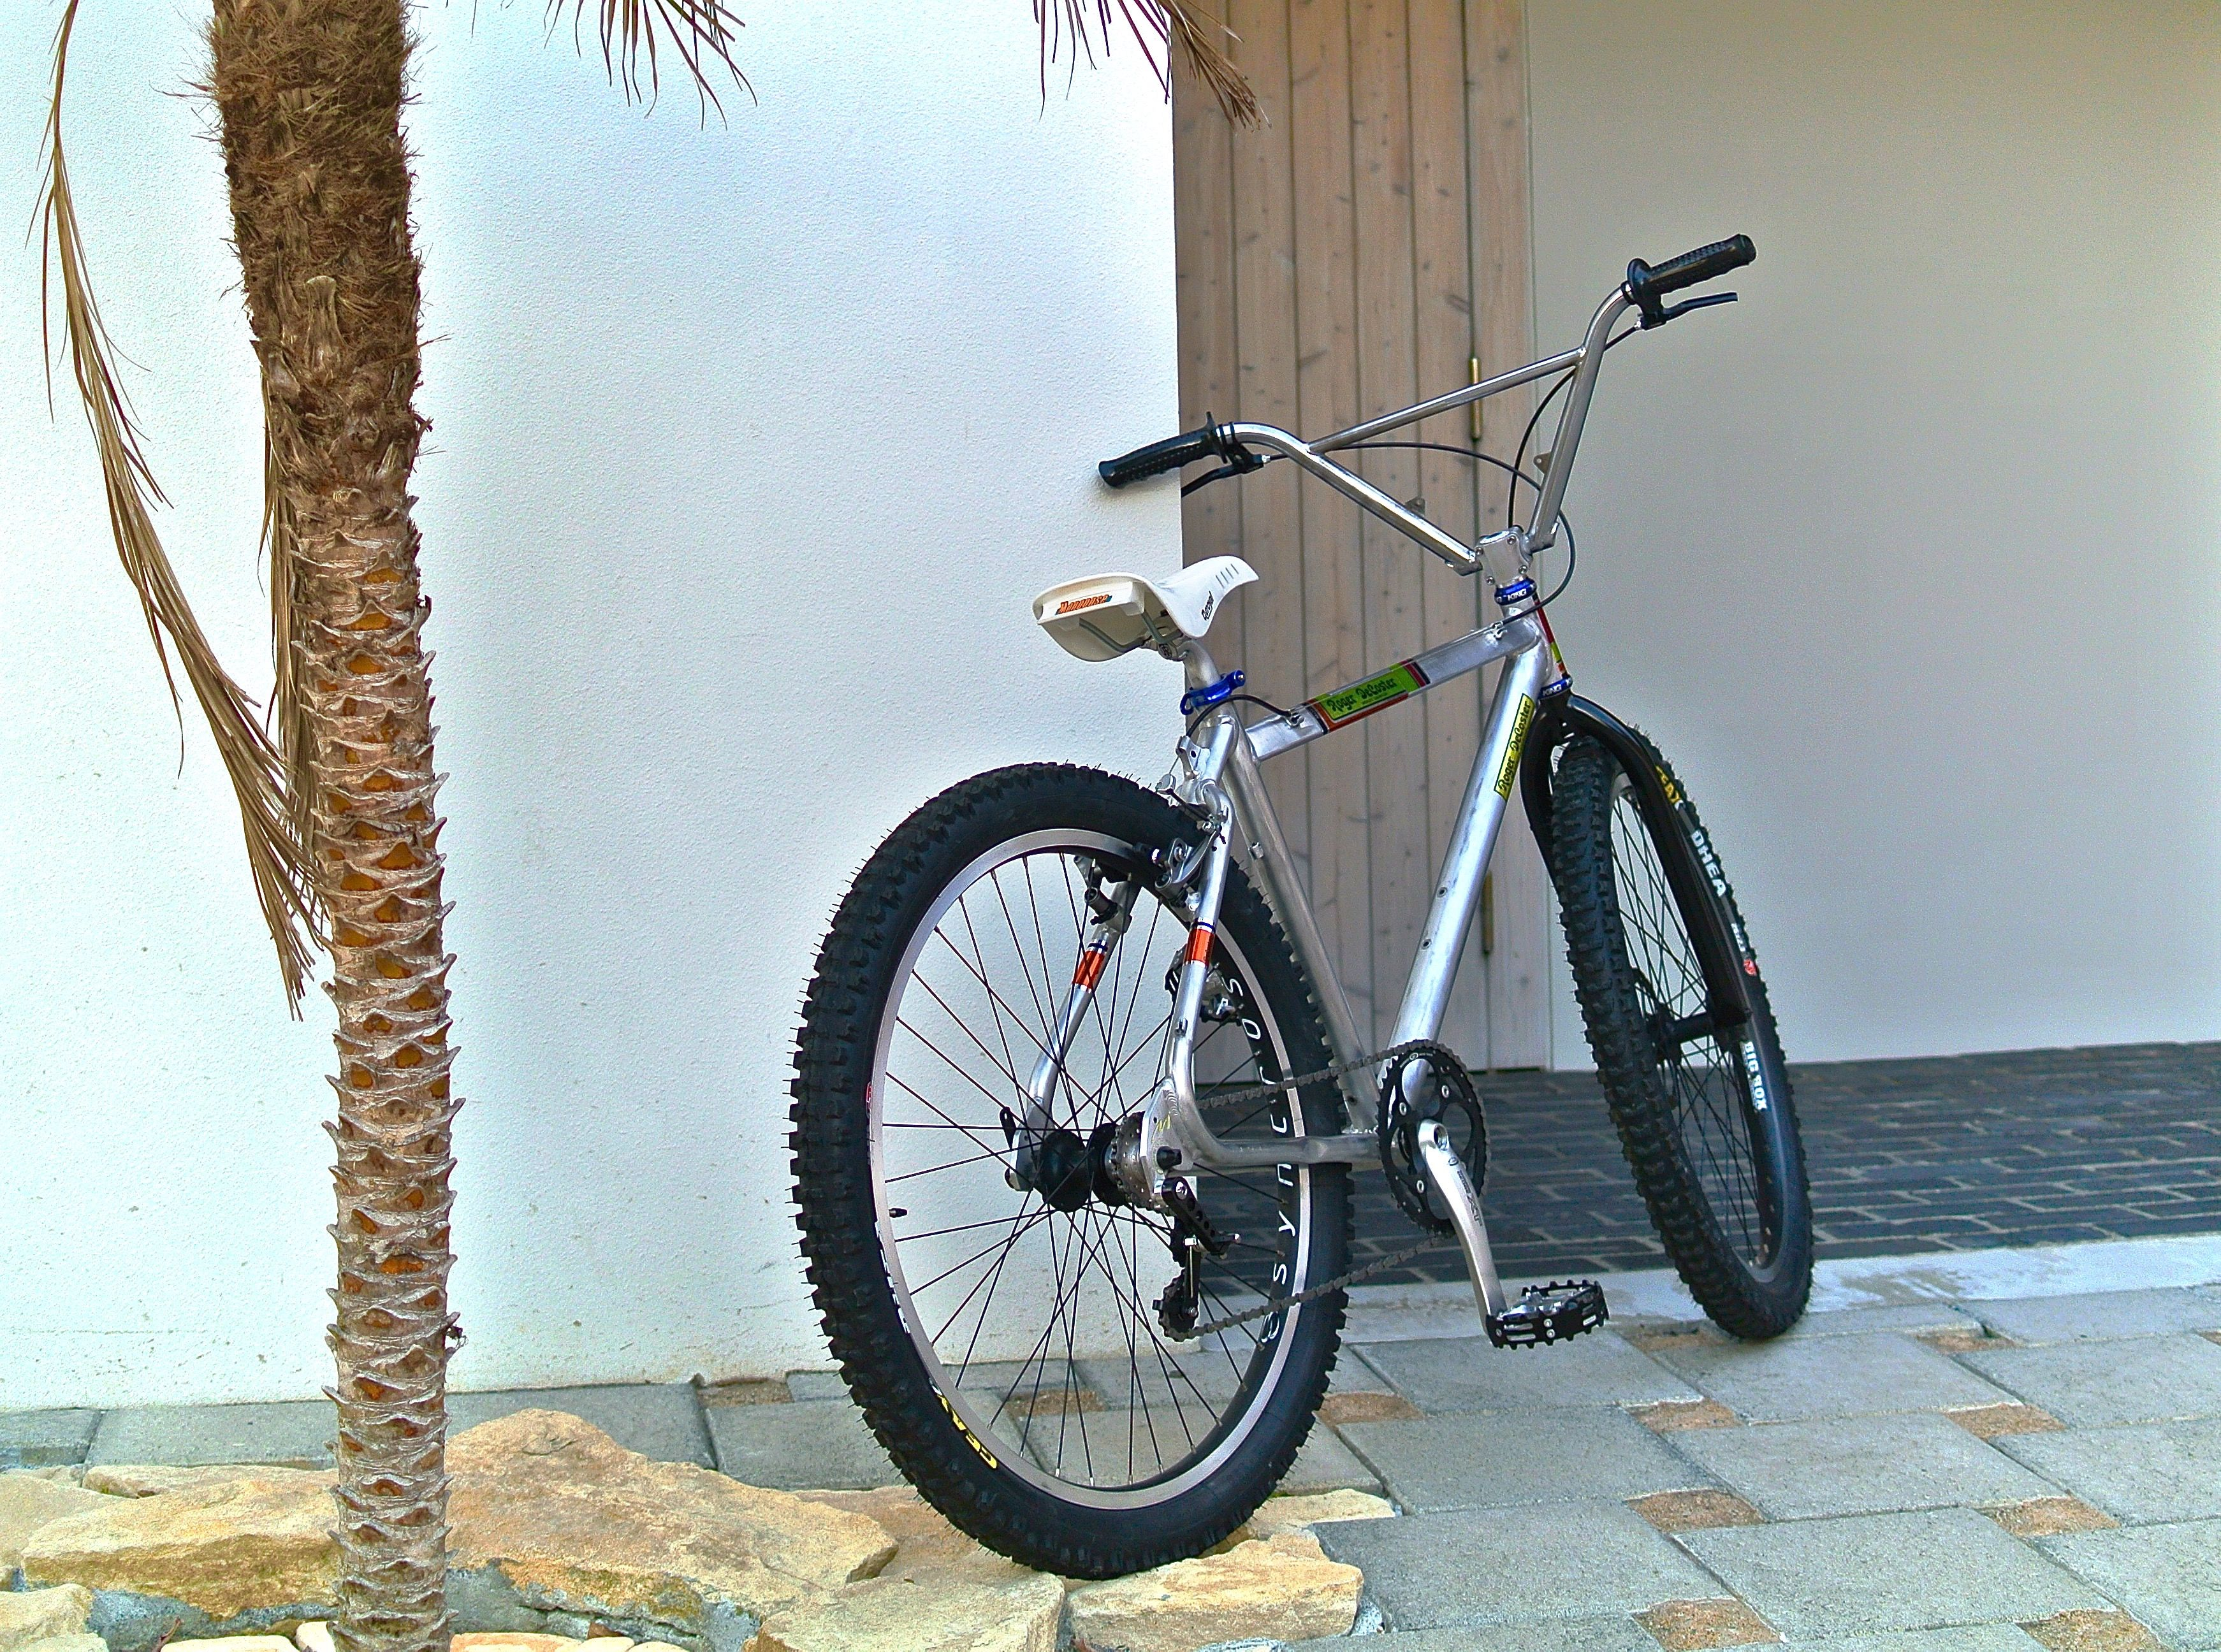 Mongoose Iboc By Unico Bikes 自転車 カスタム ピスト カスタム 自転車